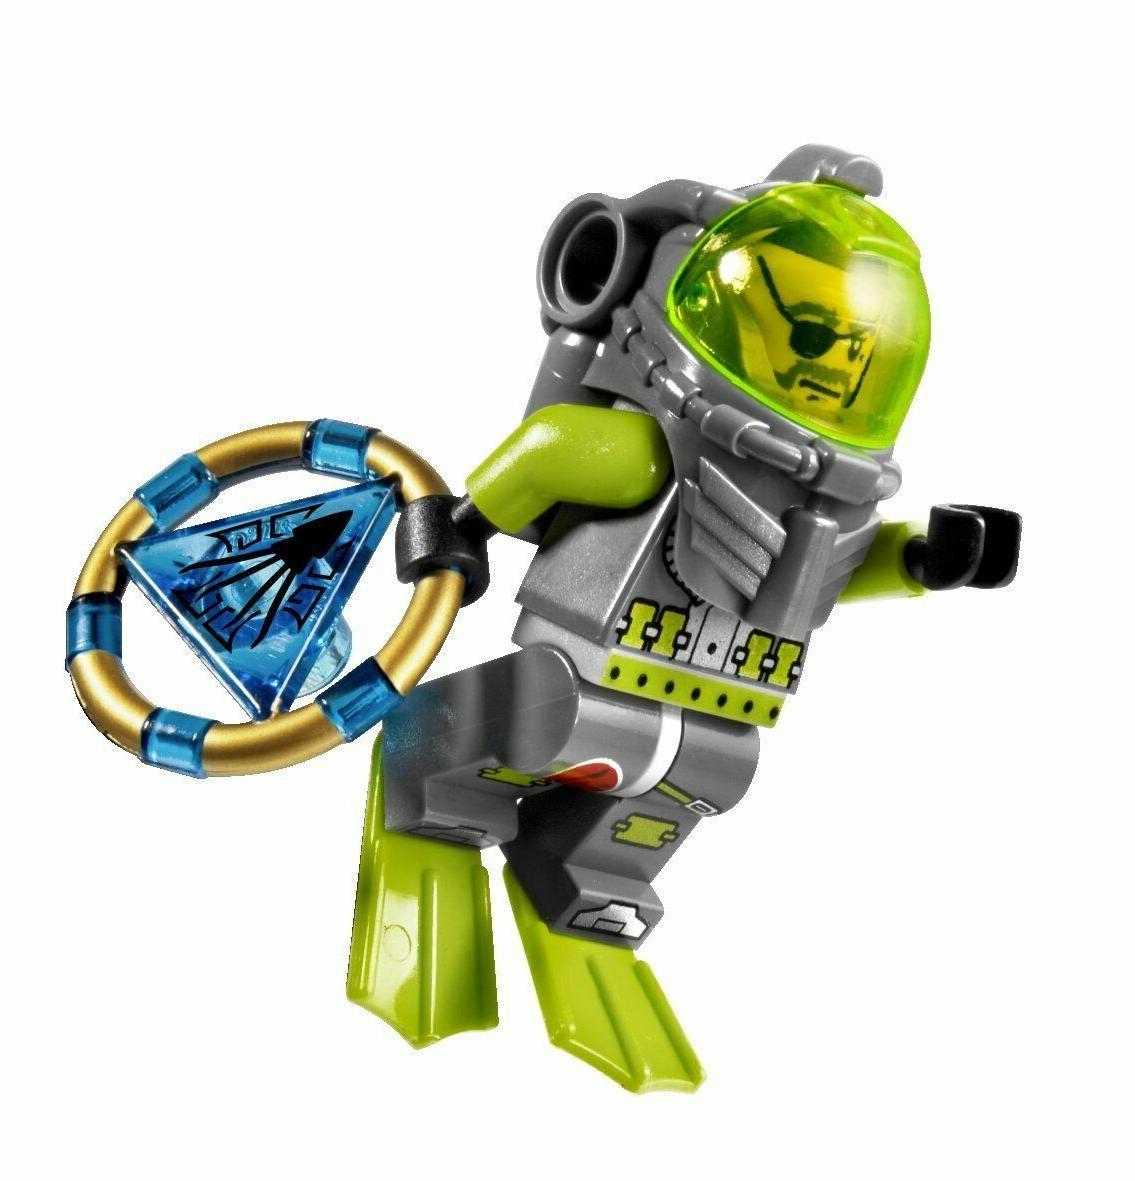 LEGO® Atlantis - Wreck Raider 8057 NEW